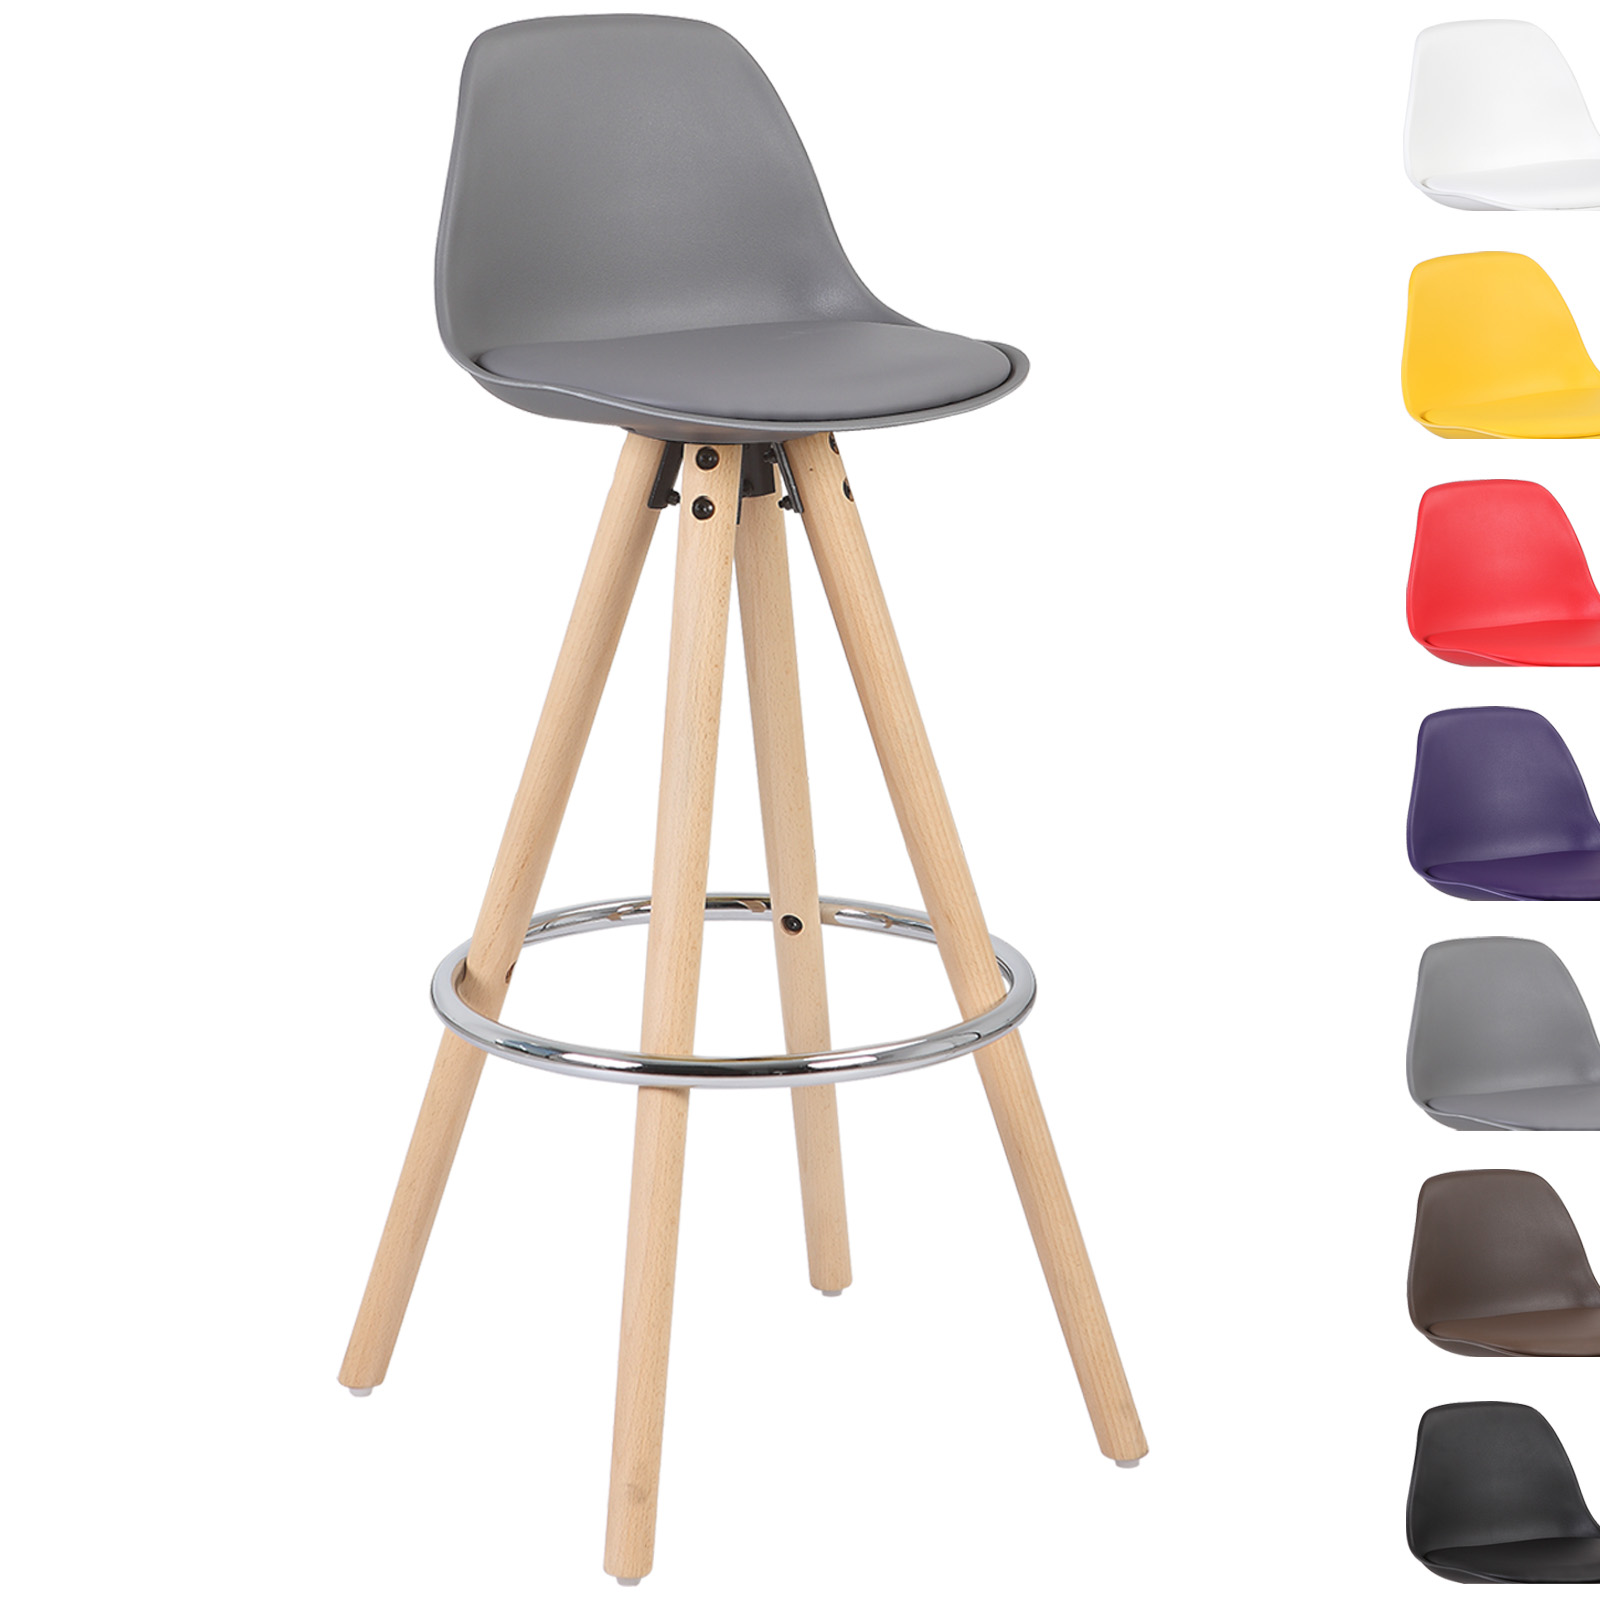 1xtabouret de bar en plastique lin si ge repose pieds design en bois pied f106 ebay. Black Bedroom Furniture Sets. Home Design Ideas